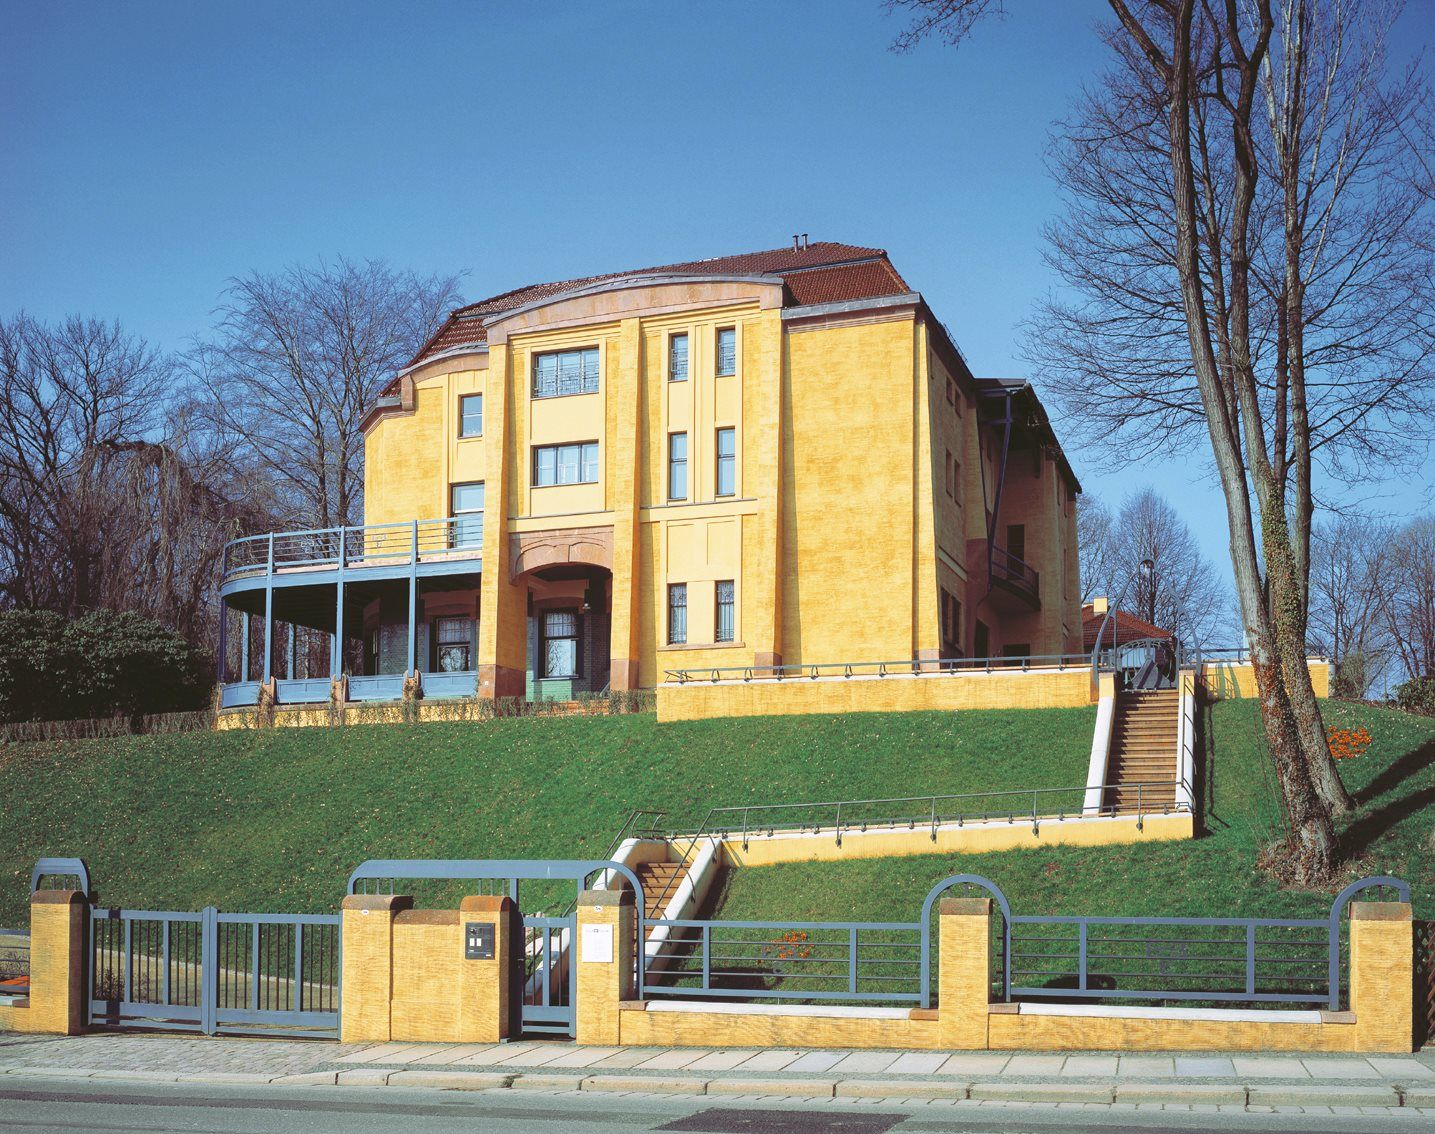 Henri van de velde private house in uccle brussels belgium